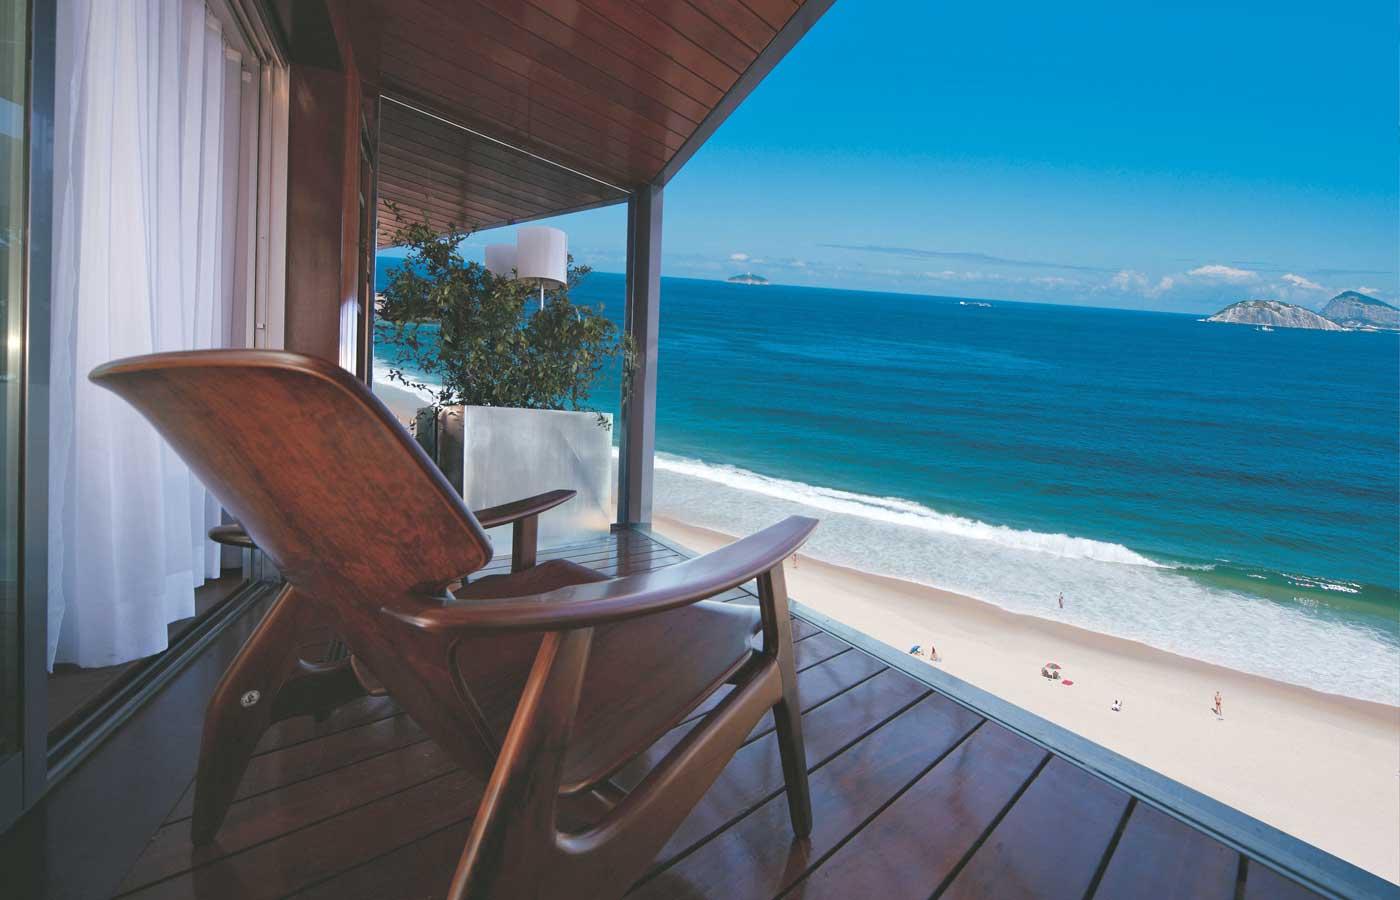 Hotel Fasano - Luxury holidays to Rio de Janeiro, Brazil